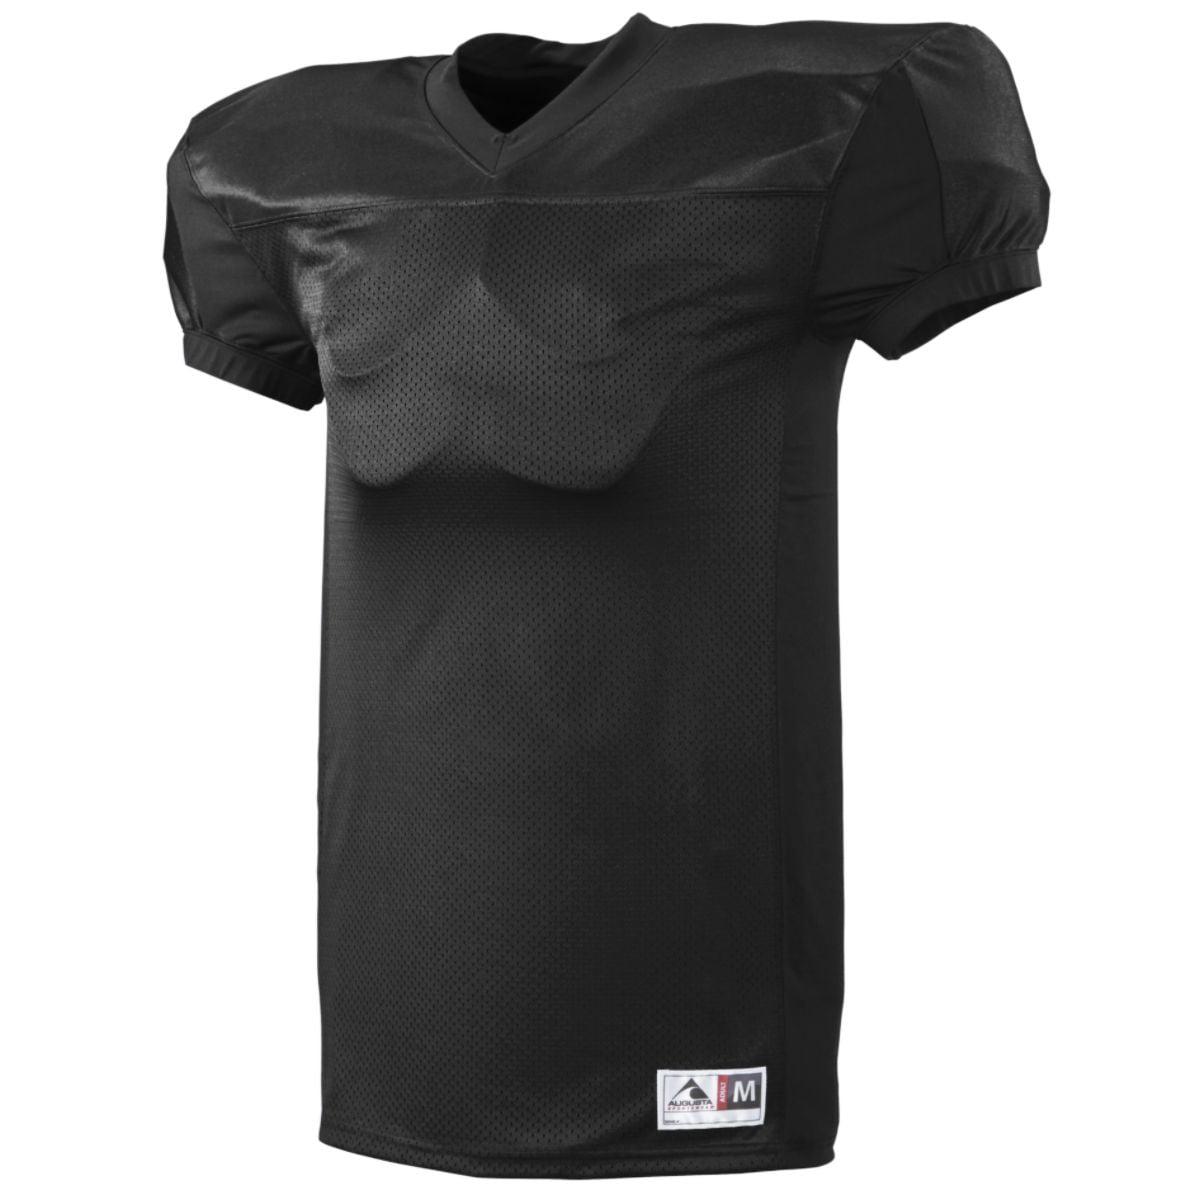 Augusta Youth Scrambler Jersey Black S - image 1 of 1